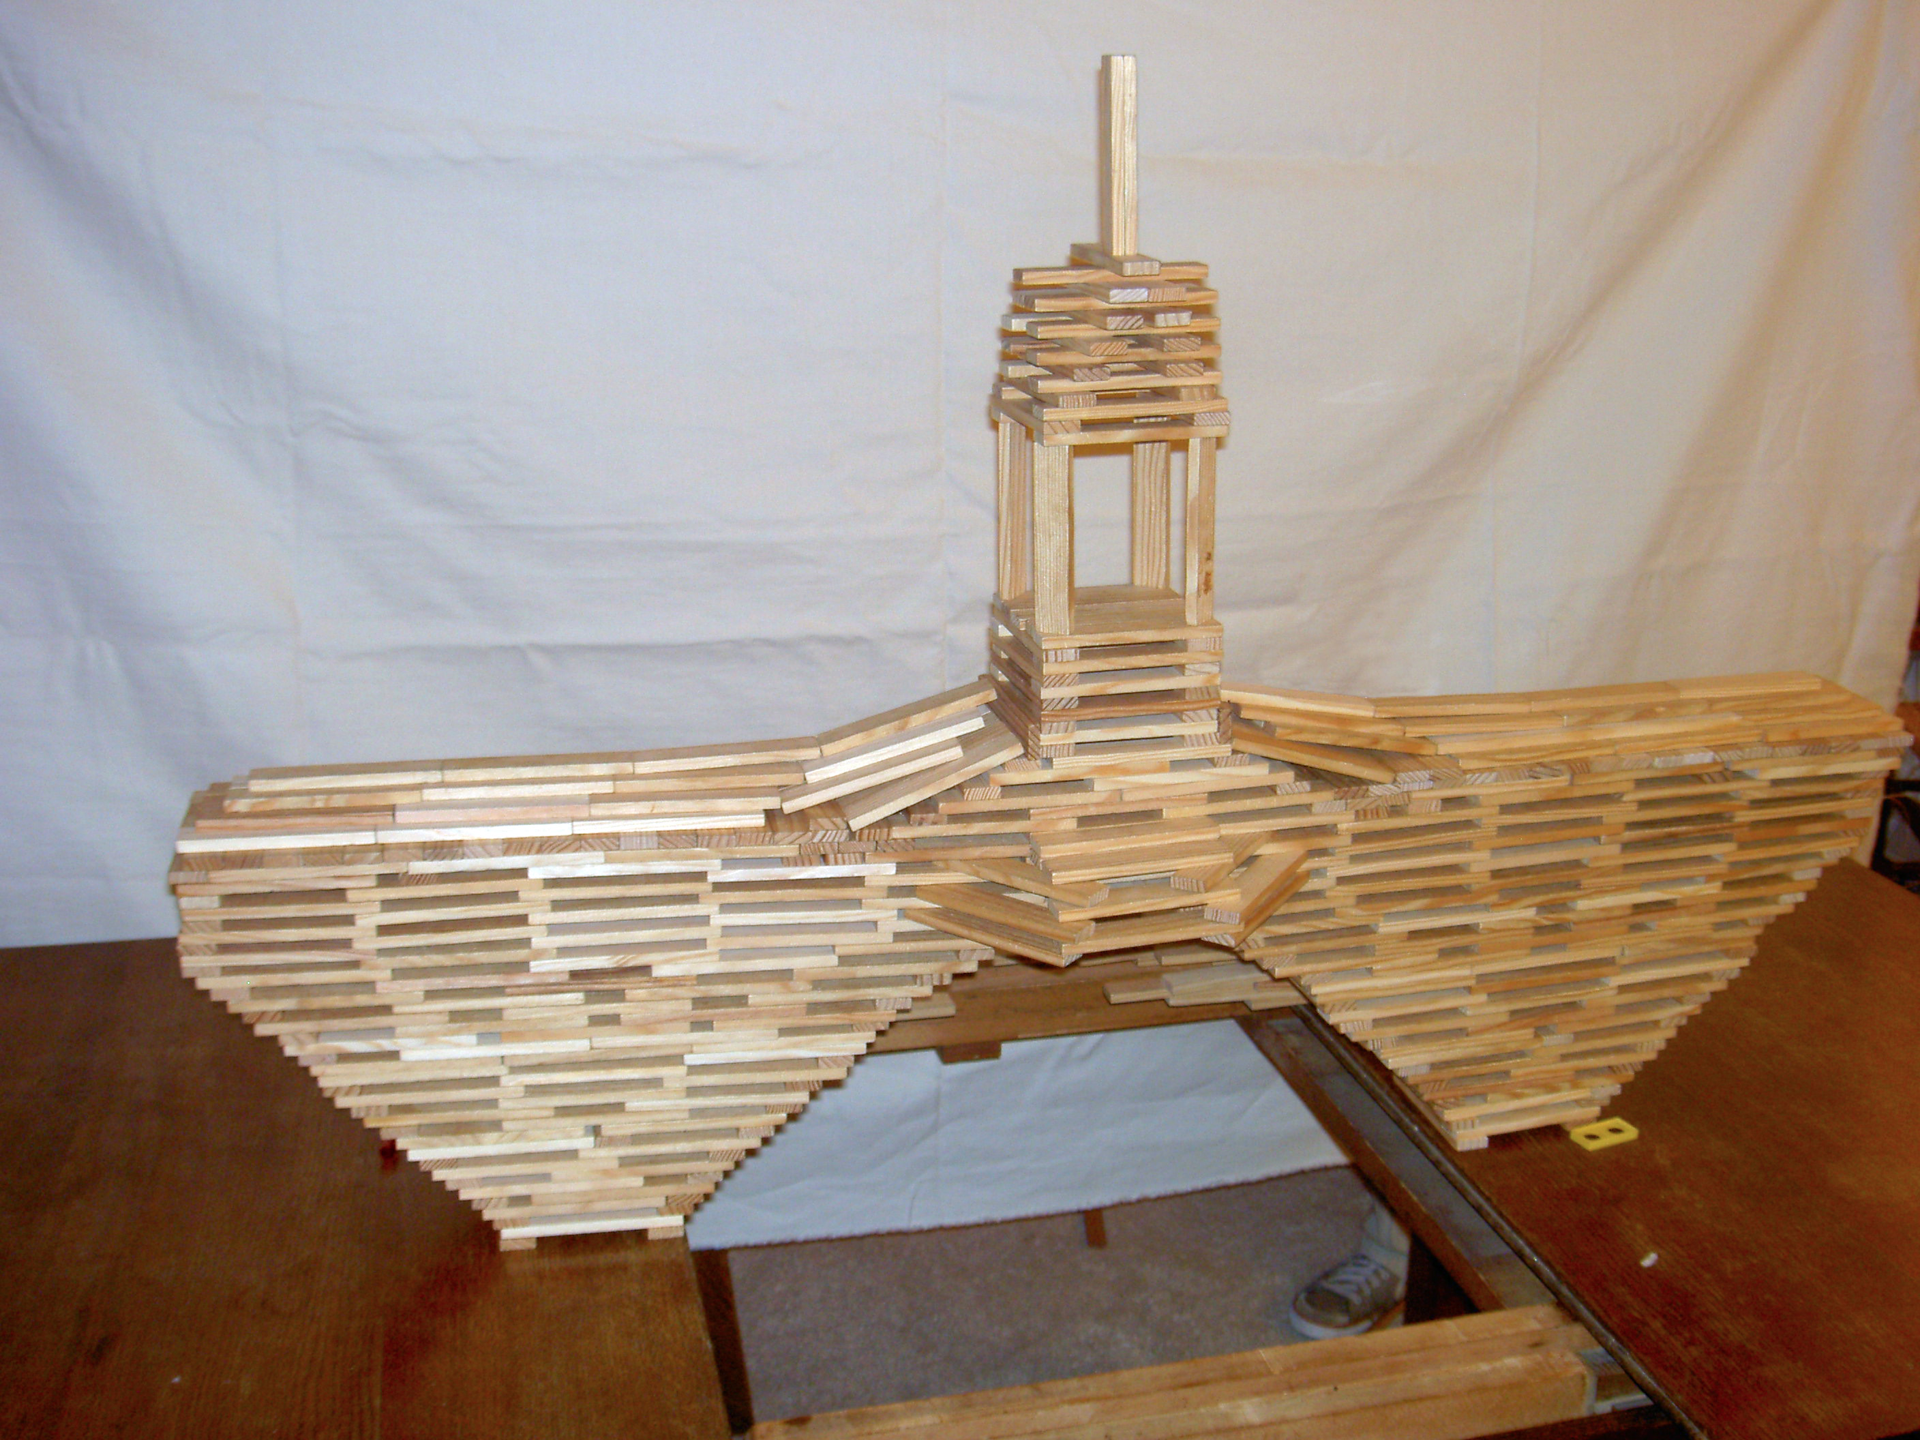 fichier kapla building jpg wikip dia On architecture kapla